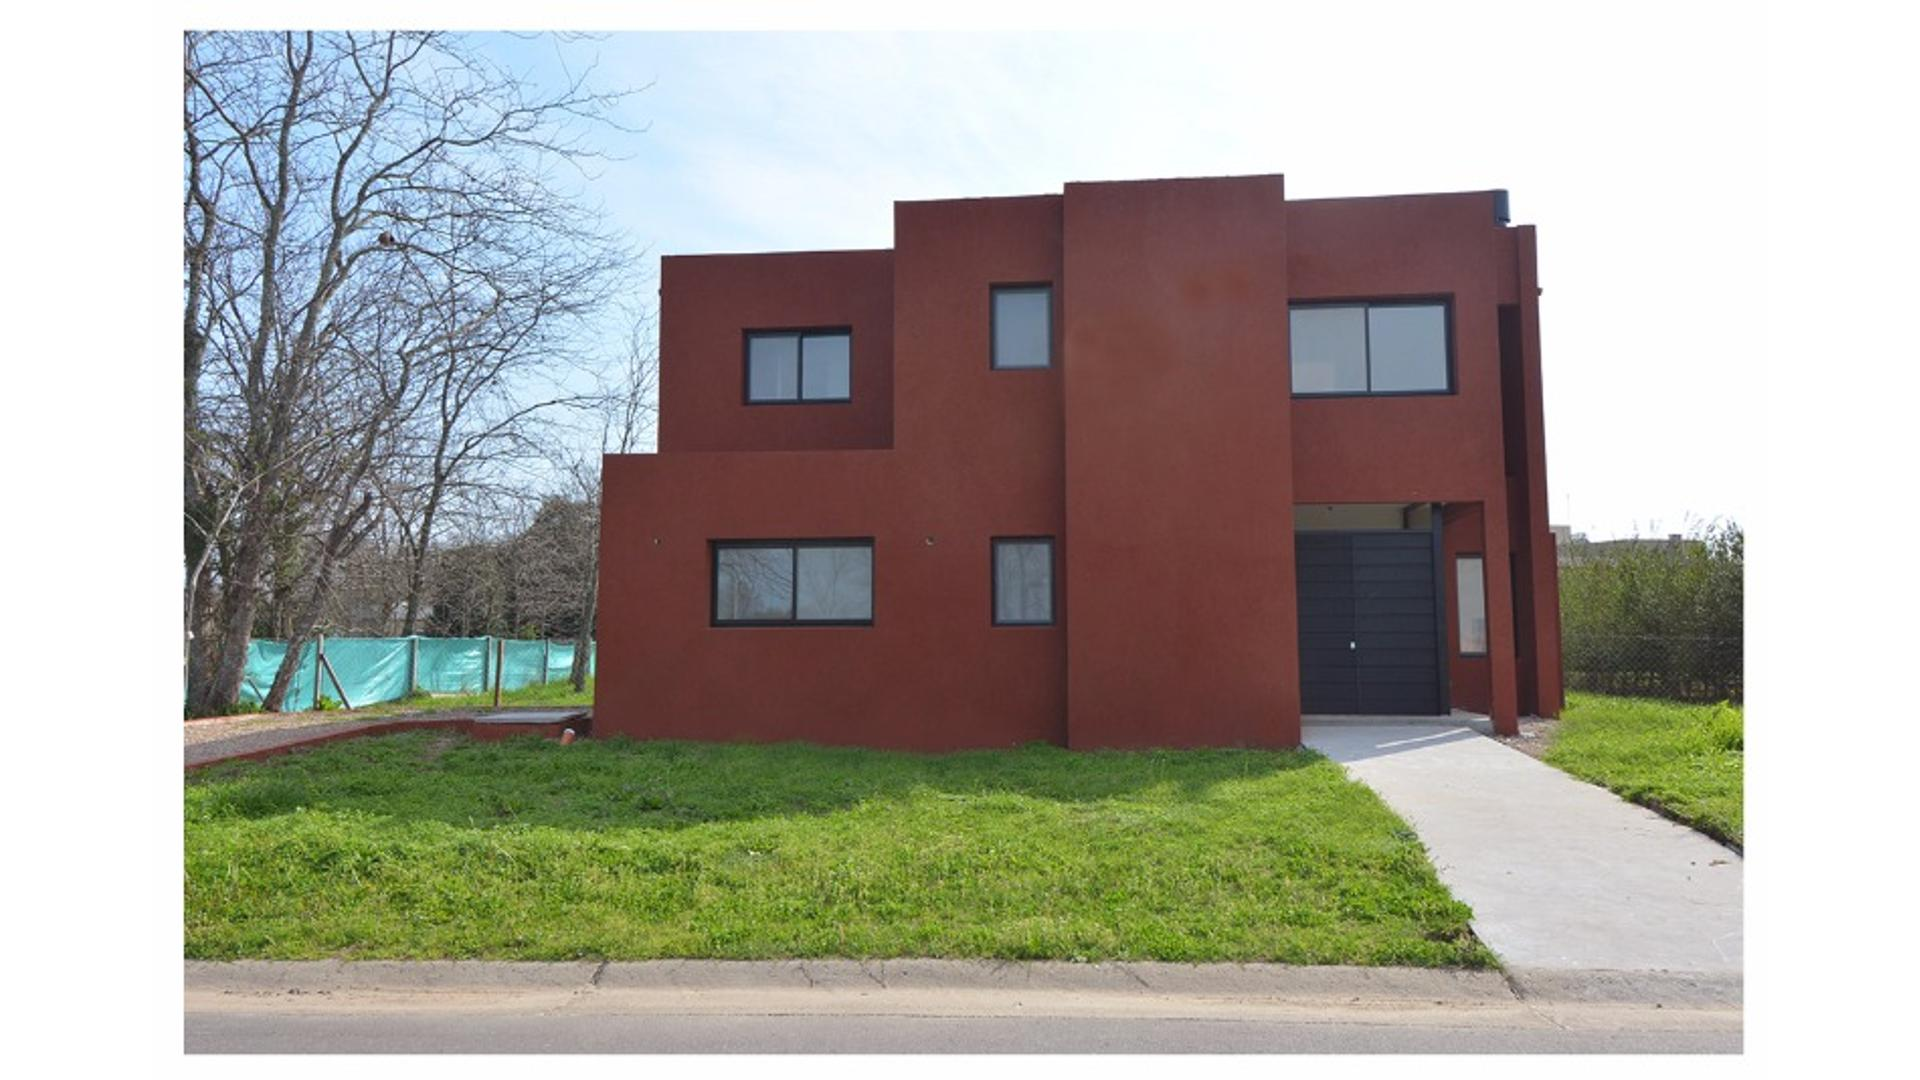 San Matías Lote / N° 170904 - U$D 285.000 - Casa en Venta